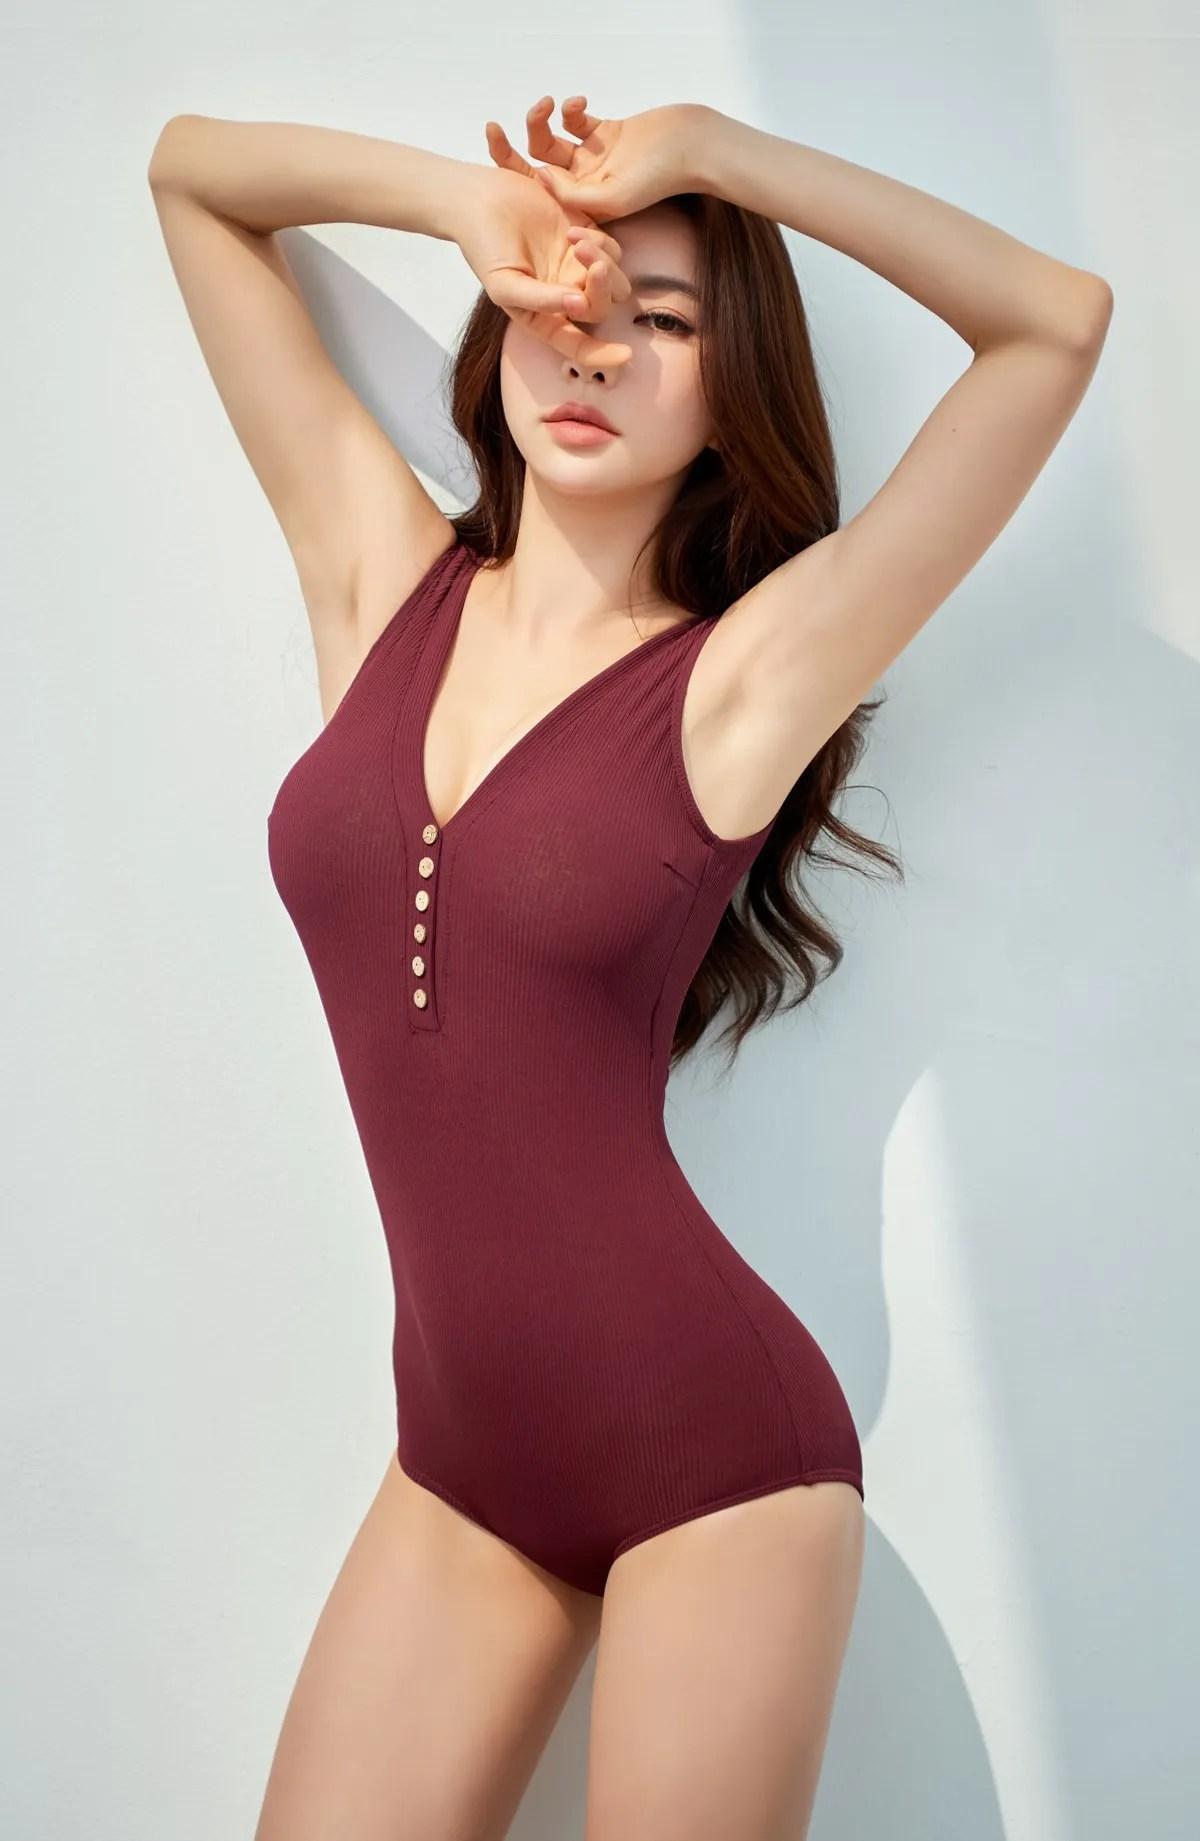 Park Suyeon / vendis / April 2021 / Beachwear Photoshoot